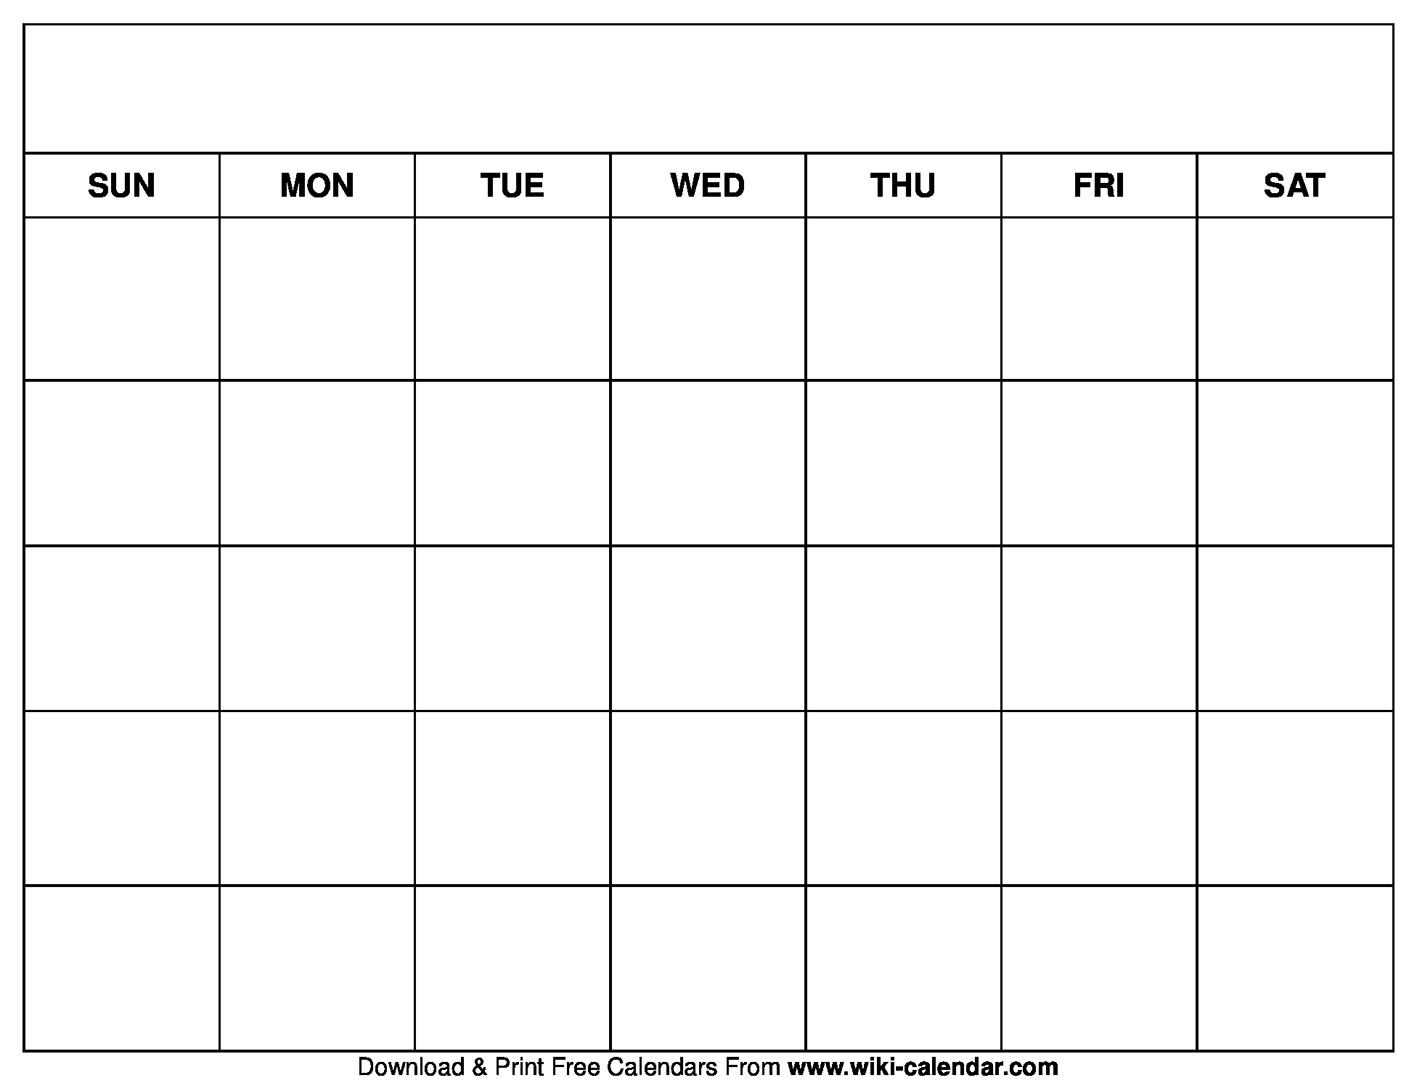 Take Free Printable Calendar Without Download